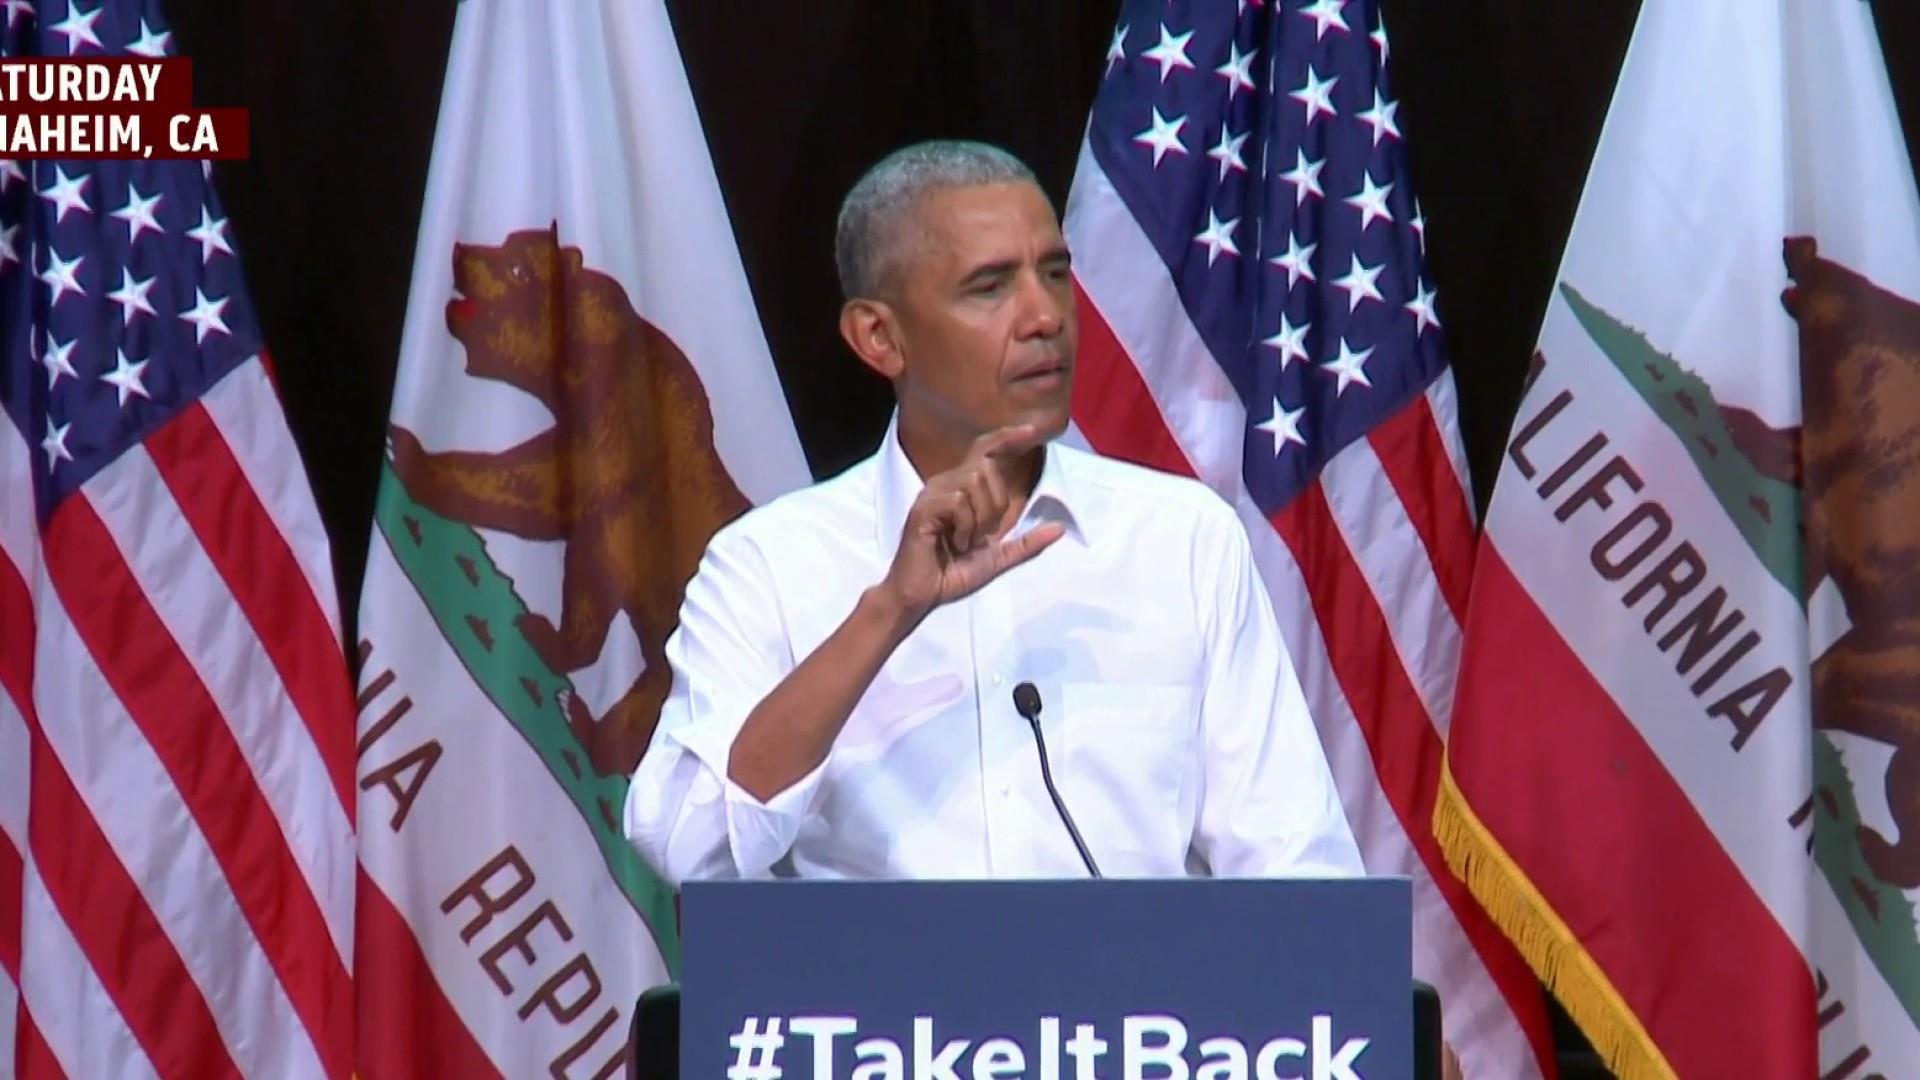 Obama brings civil discourse back to campaign trail